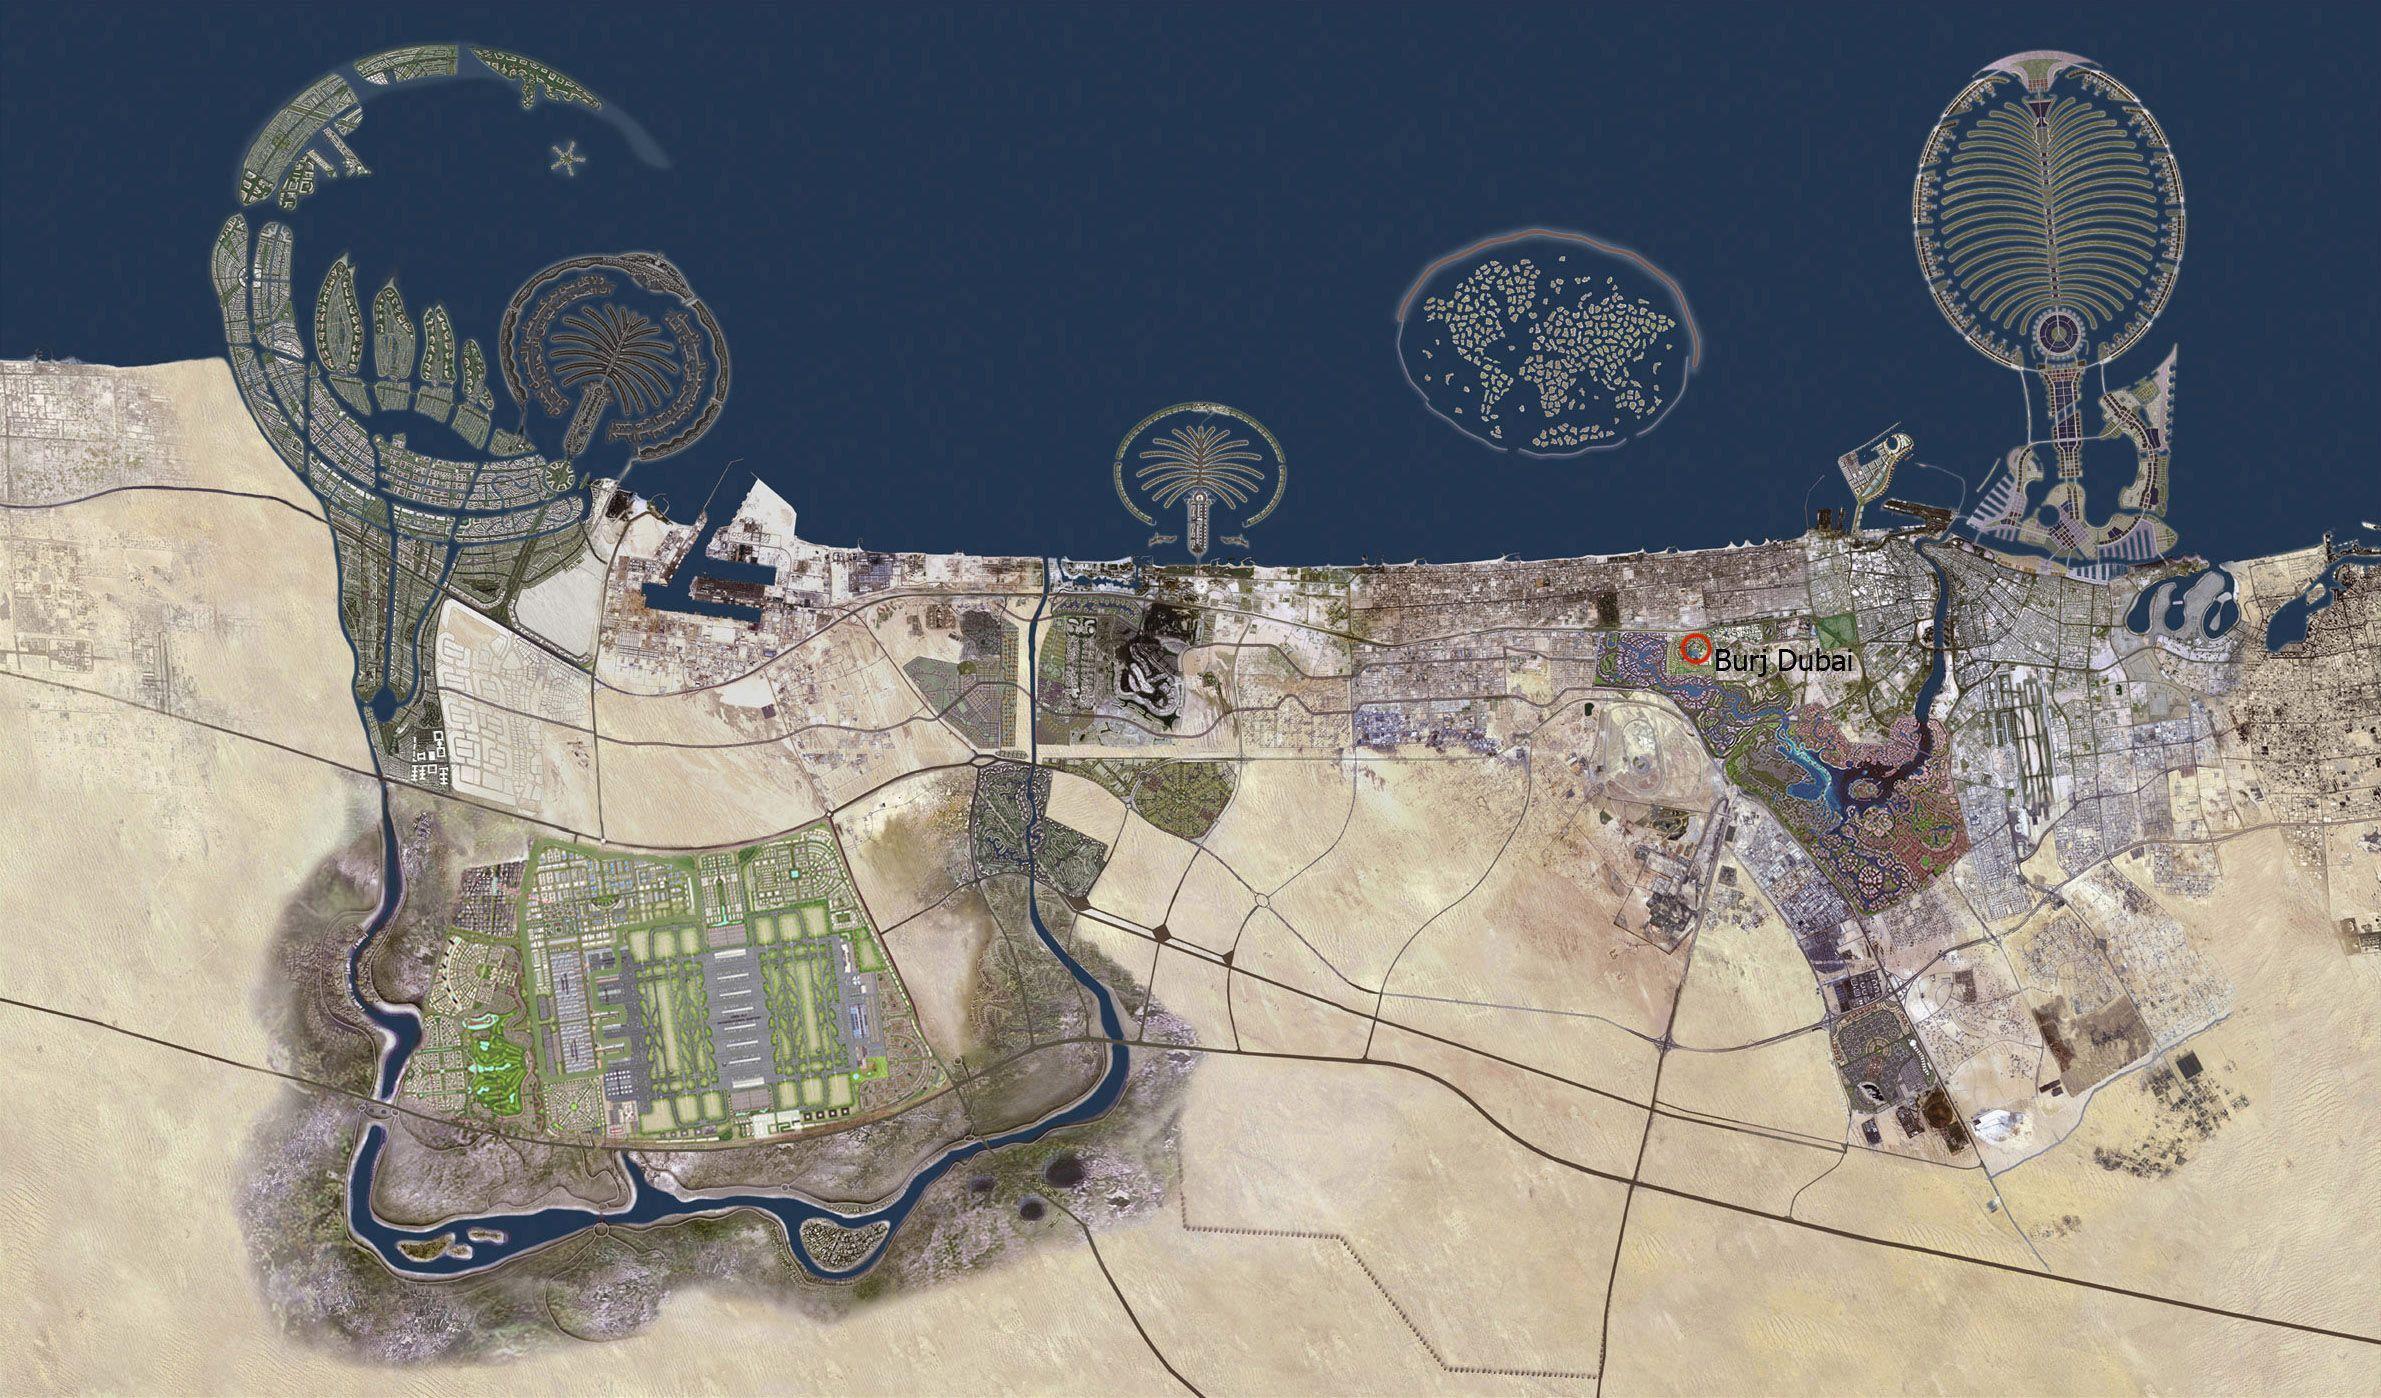 Dubai burj dubai location on the map dubai before i die dubai burj dubai location on the map gumiabroncs Gallery